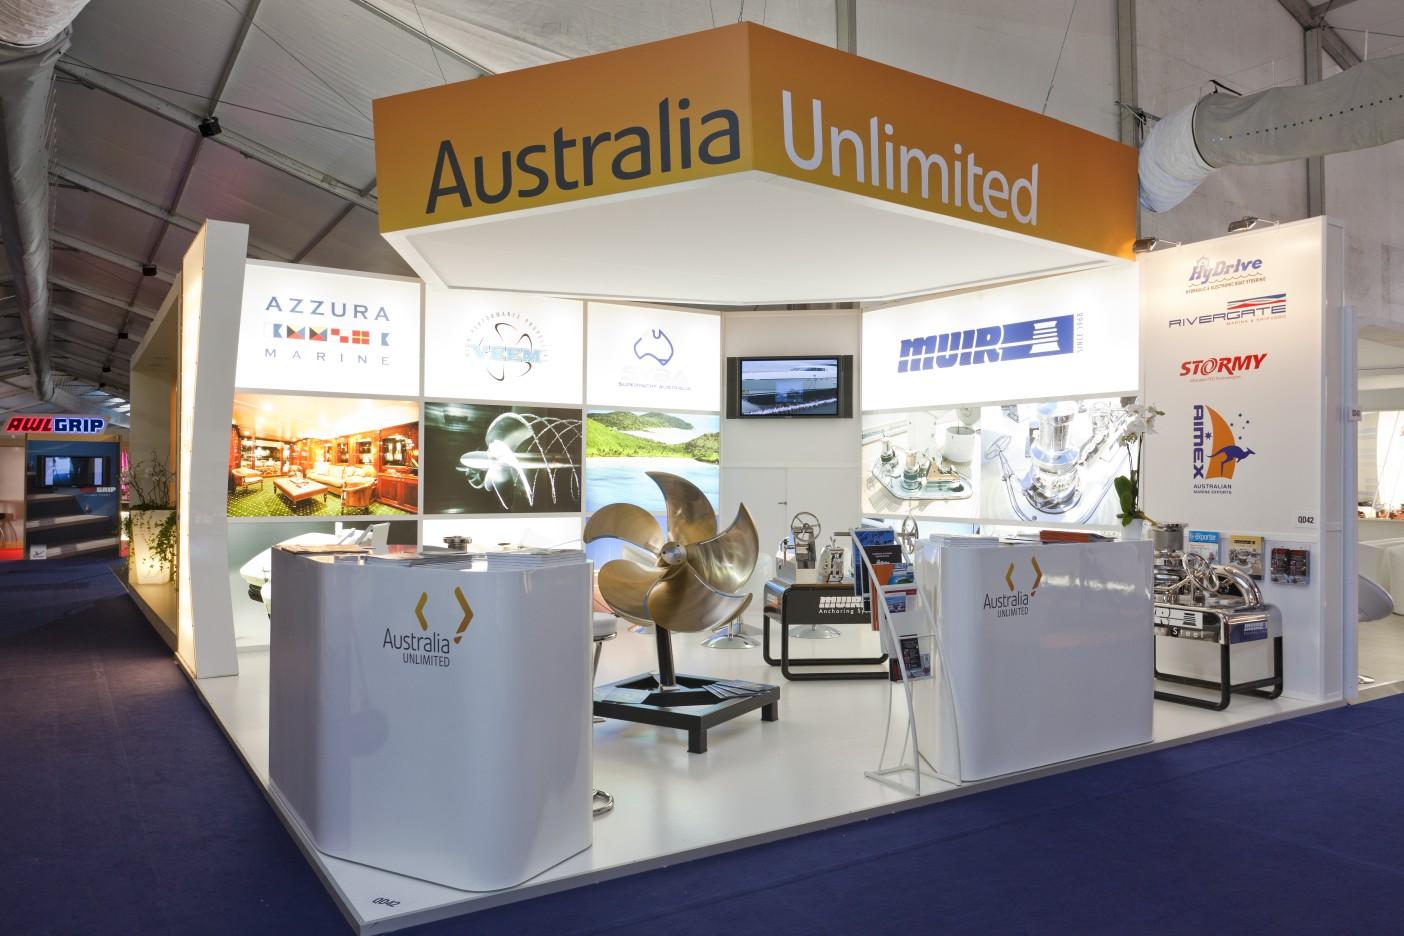 Australian Pavilion at Monaco Yacht Show 2011 using Australia Unlimited